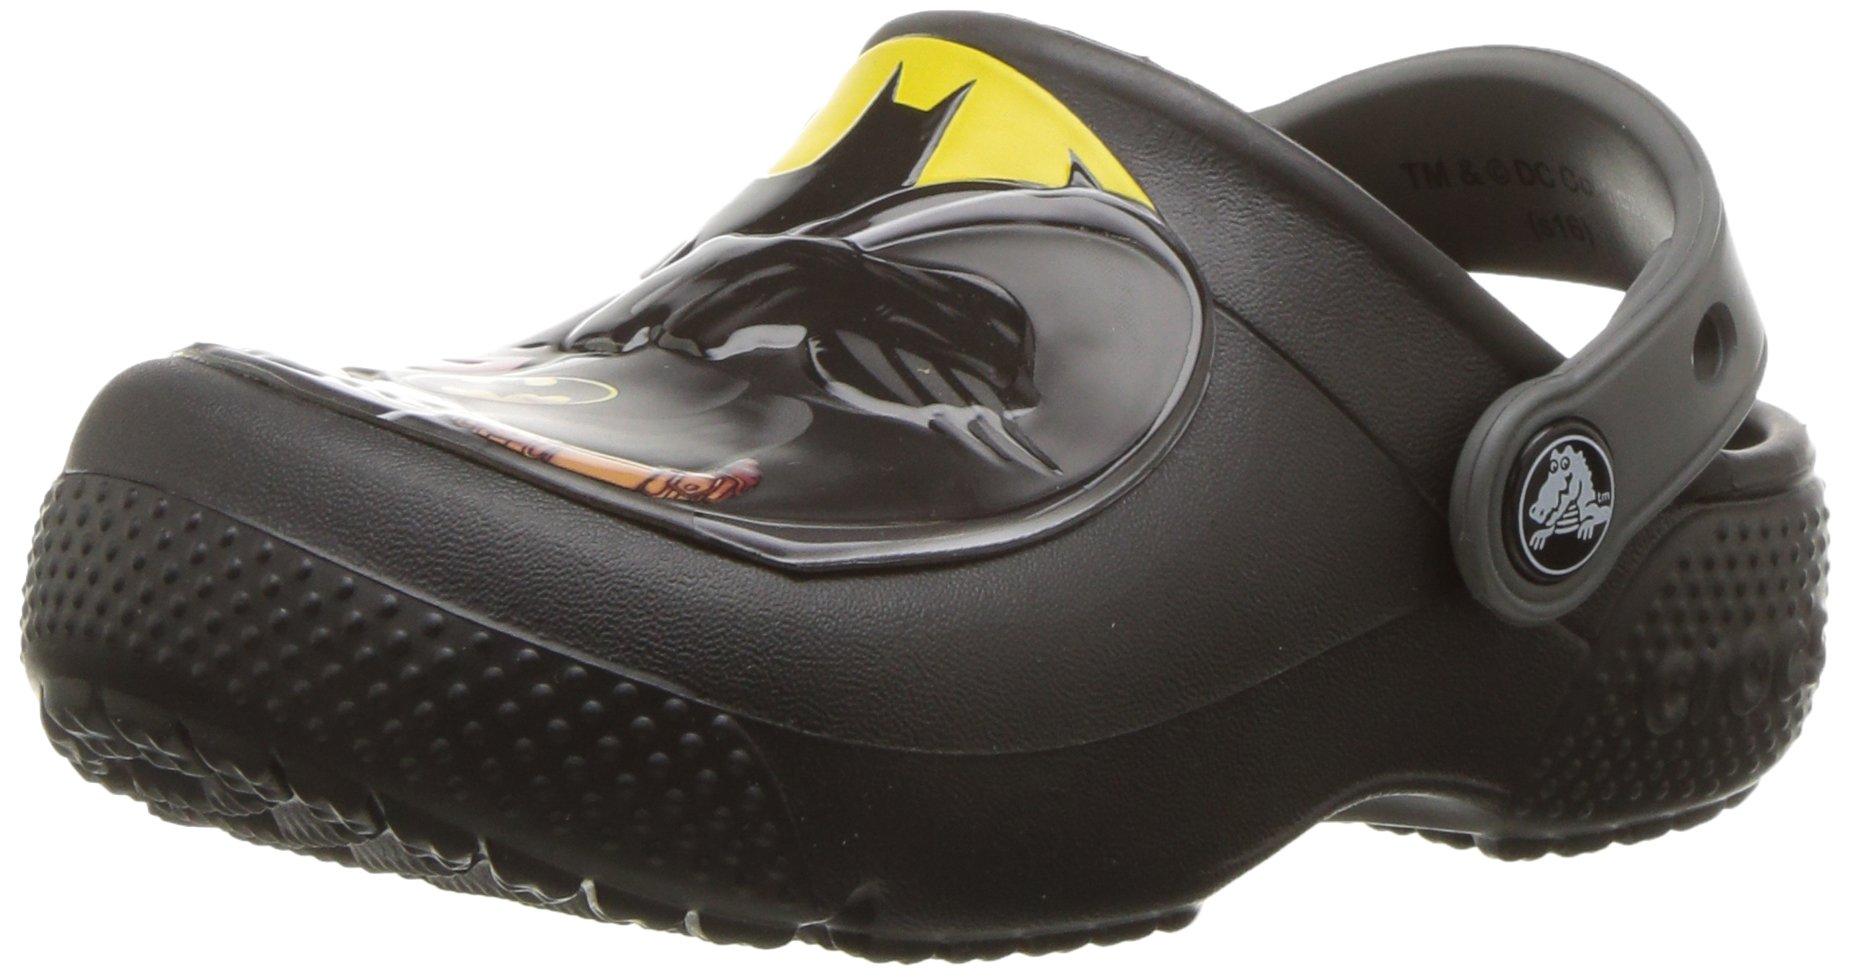 Crocs Boys FL Batman Clog K, Black, 12 M US Little Kid